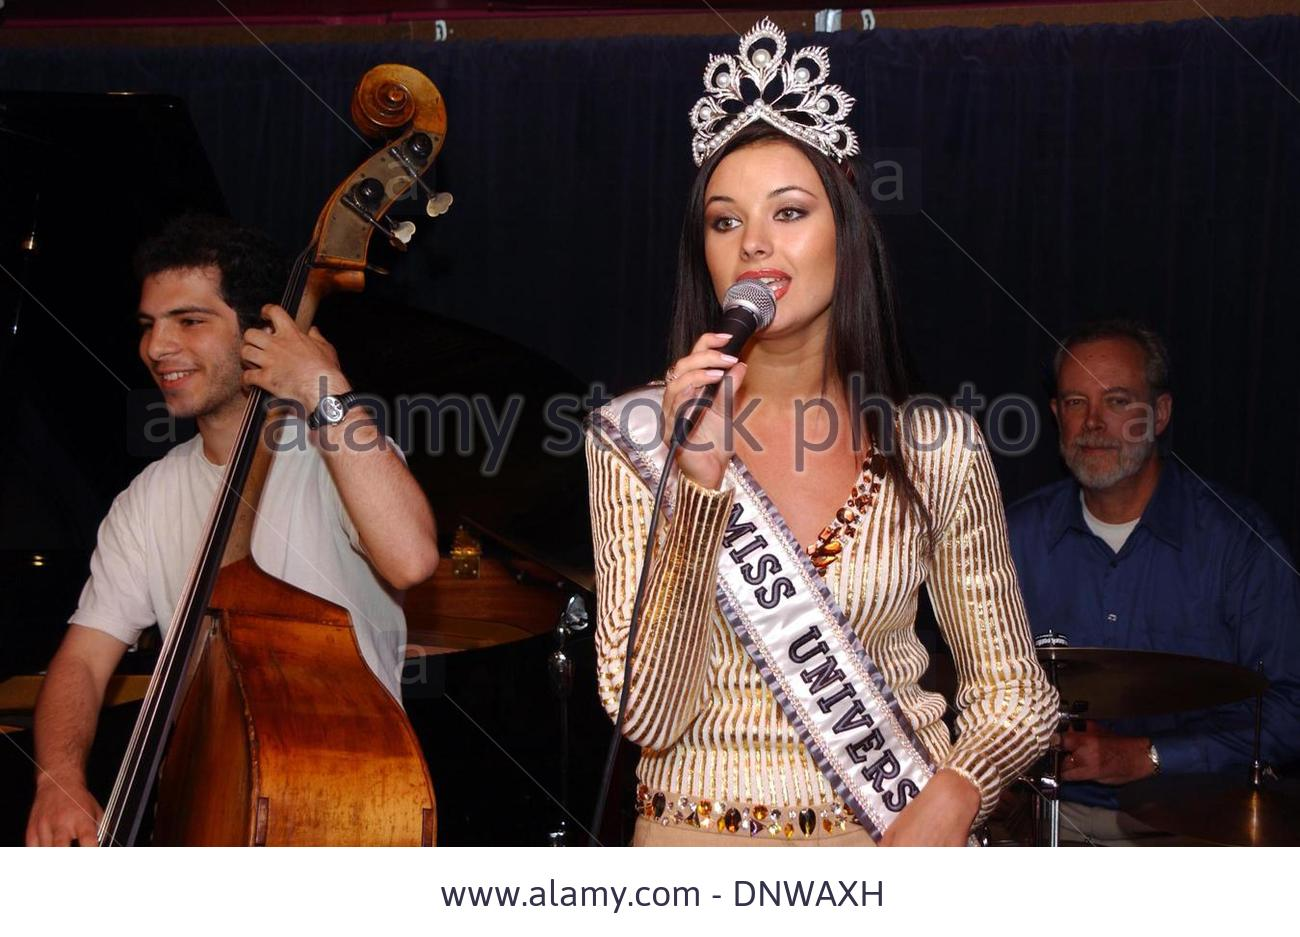 oxana fedorova, miss universe 2002 (renuncio). - Página 4 9f54od79